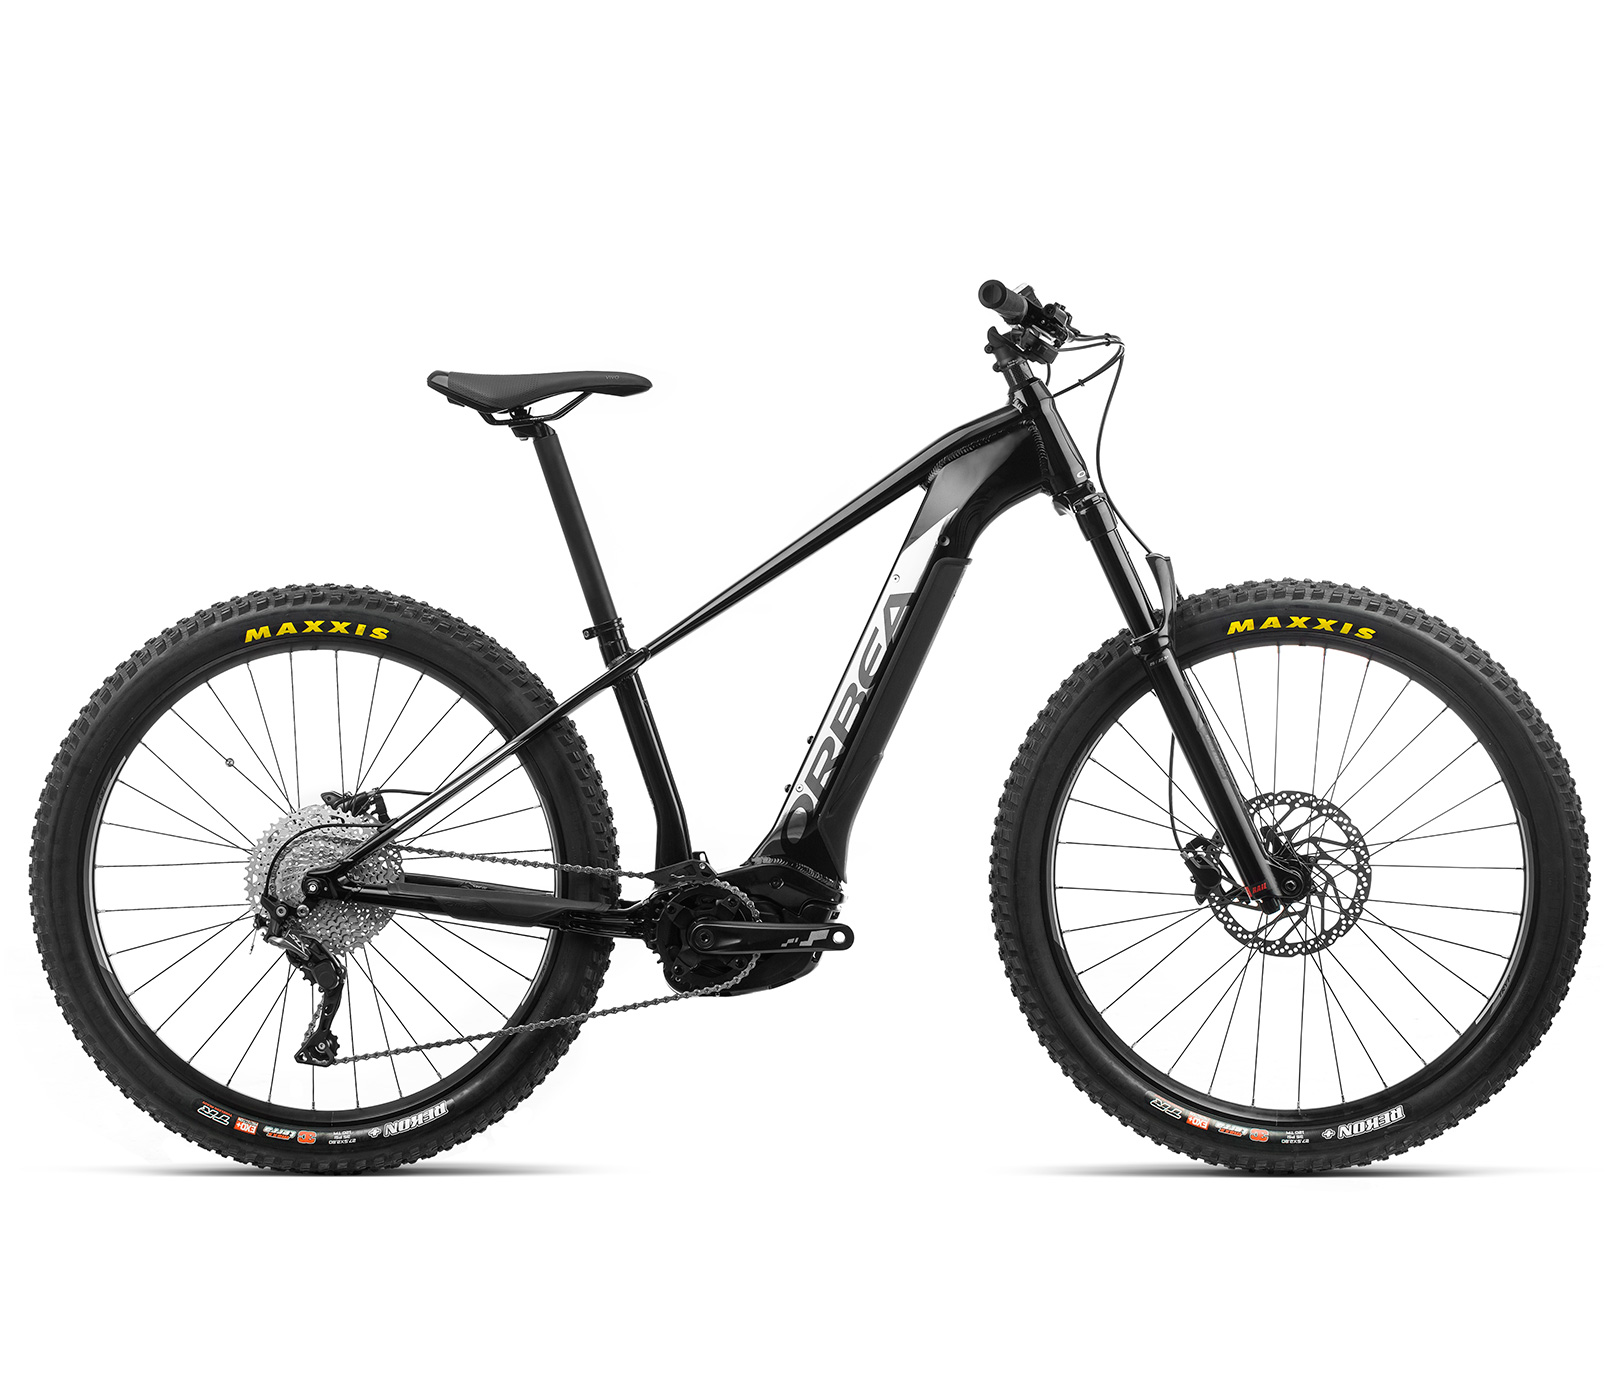 ORBEA WILD HT30 27 ebike - METALLIC ZWART / TITANIUM(GLOSS) @G-Bikes